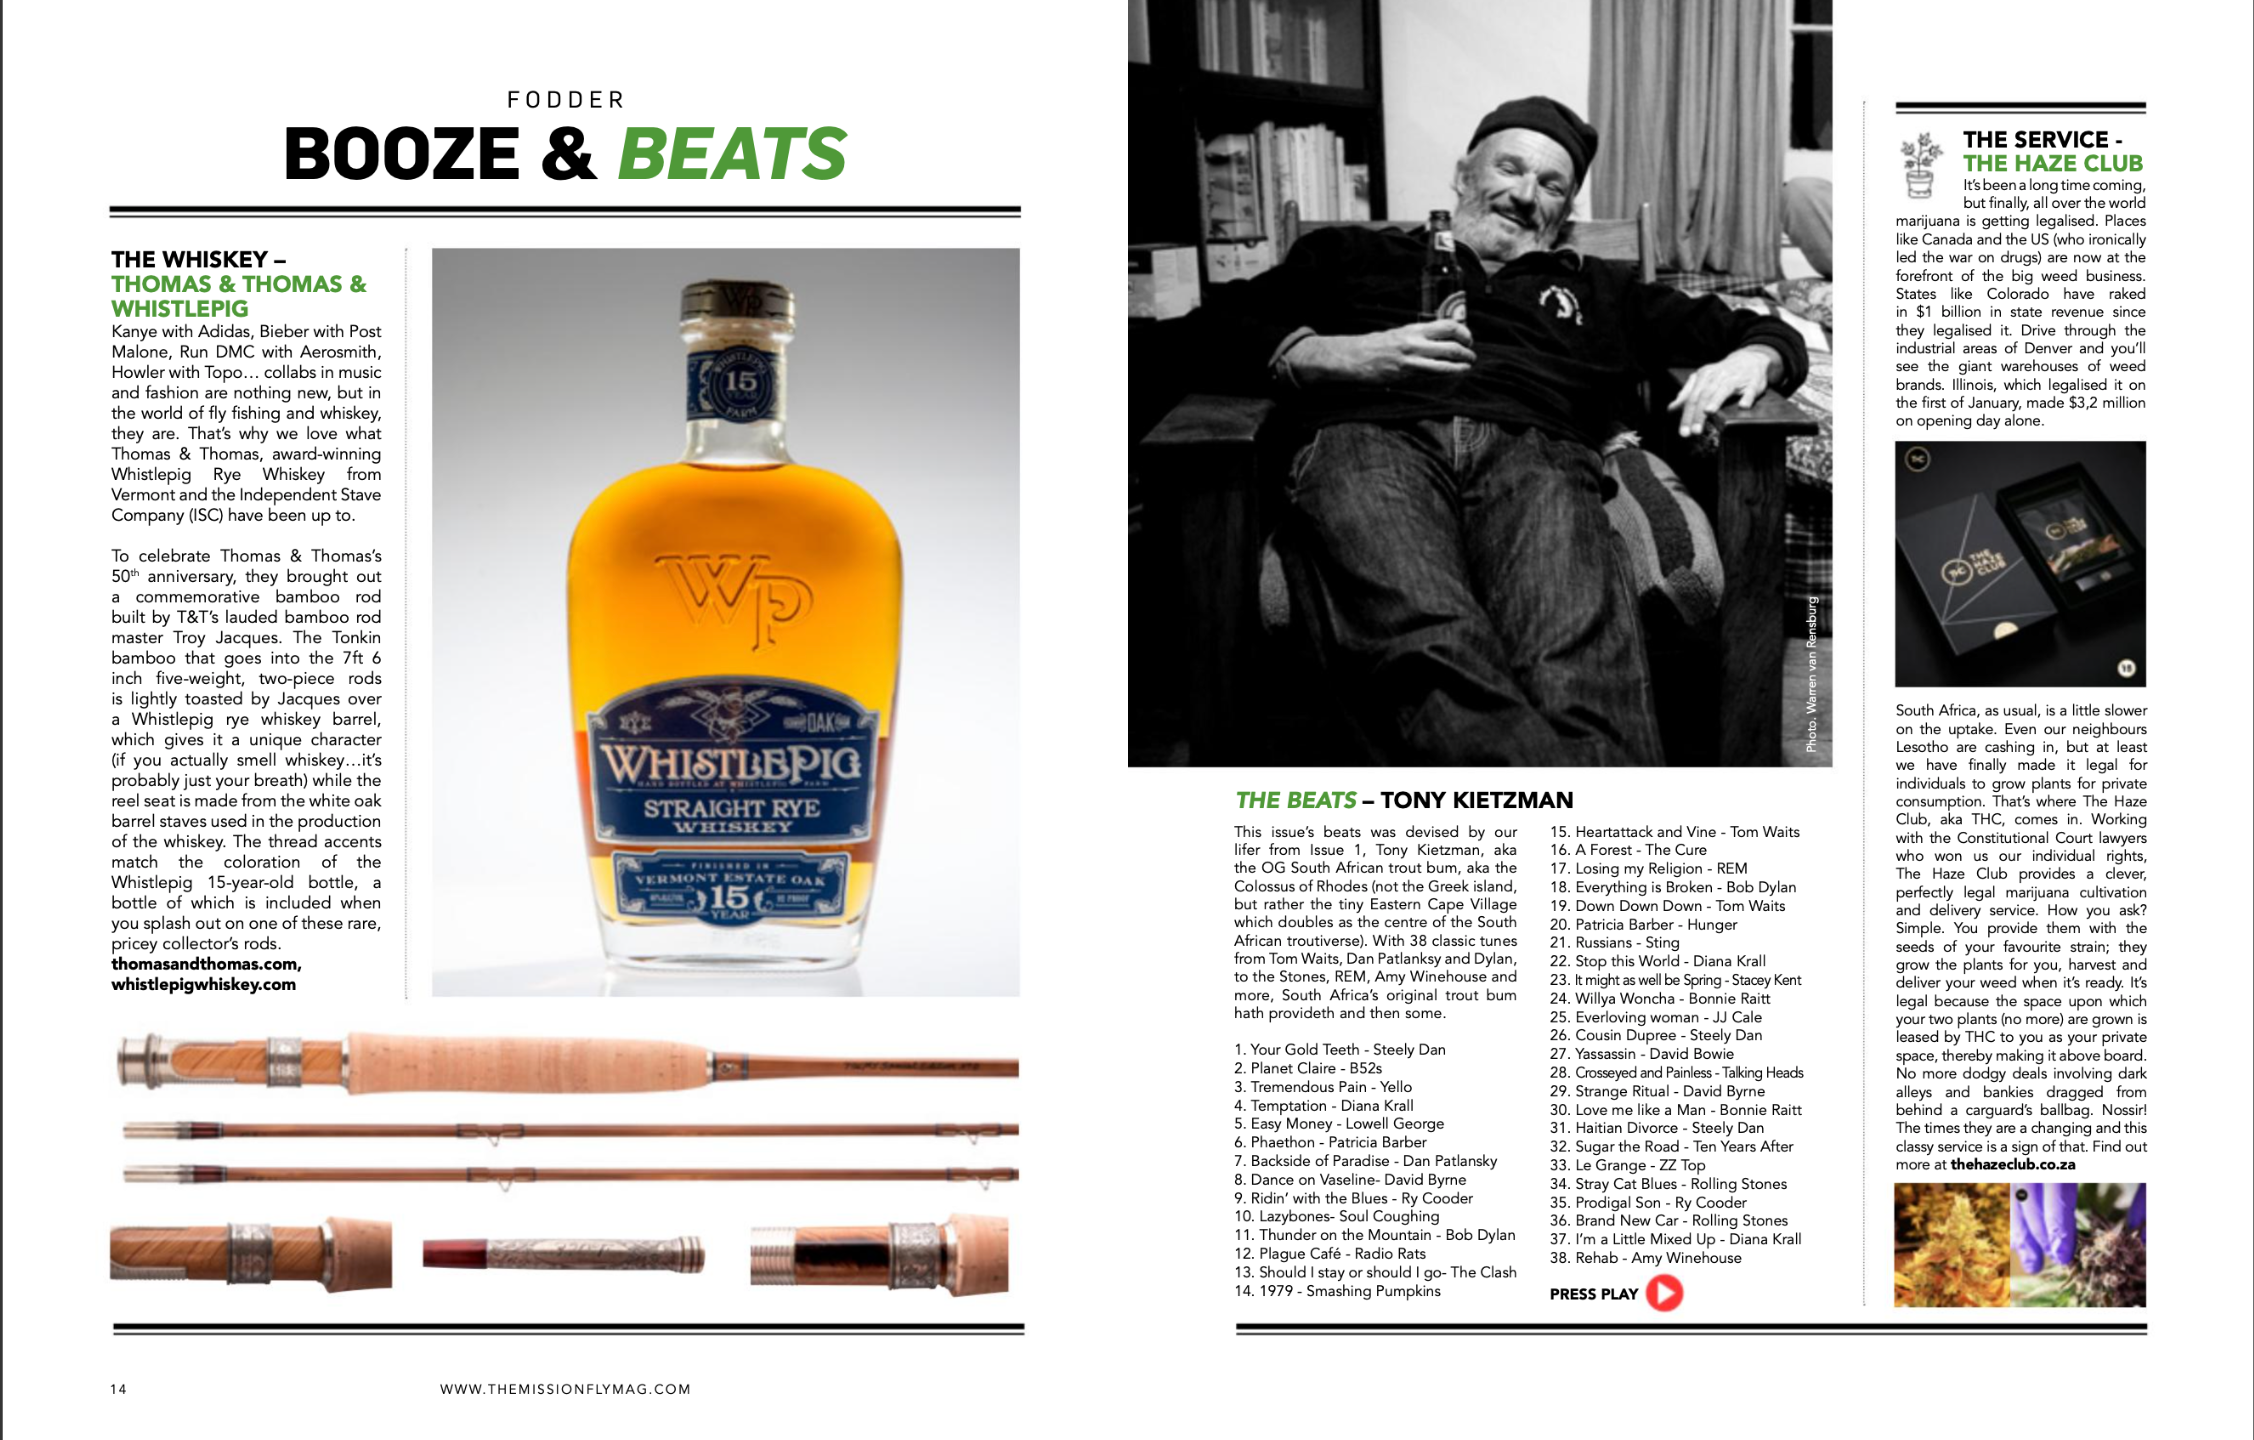 booze & beats